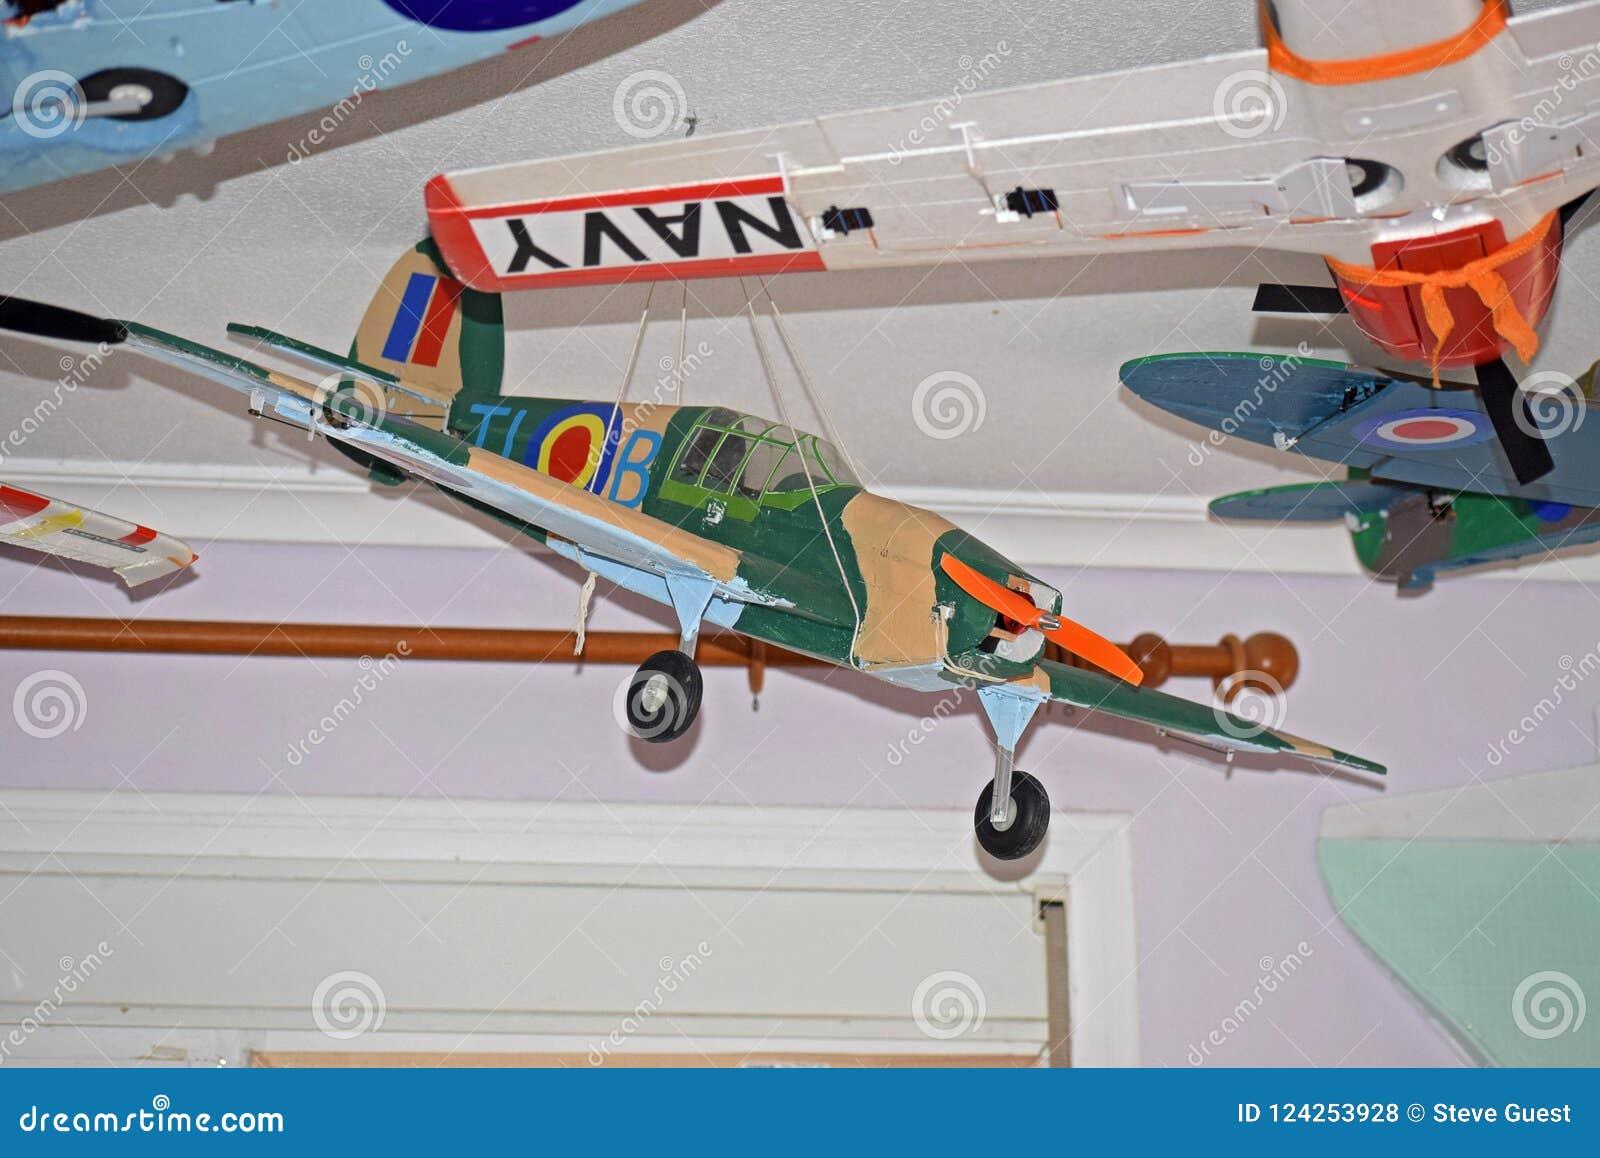 Model Aircraft Hawker Hurricane  Stock Photo - Image of